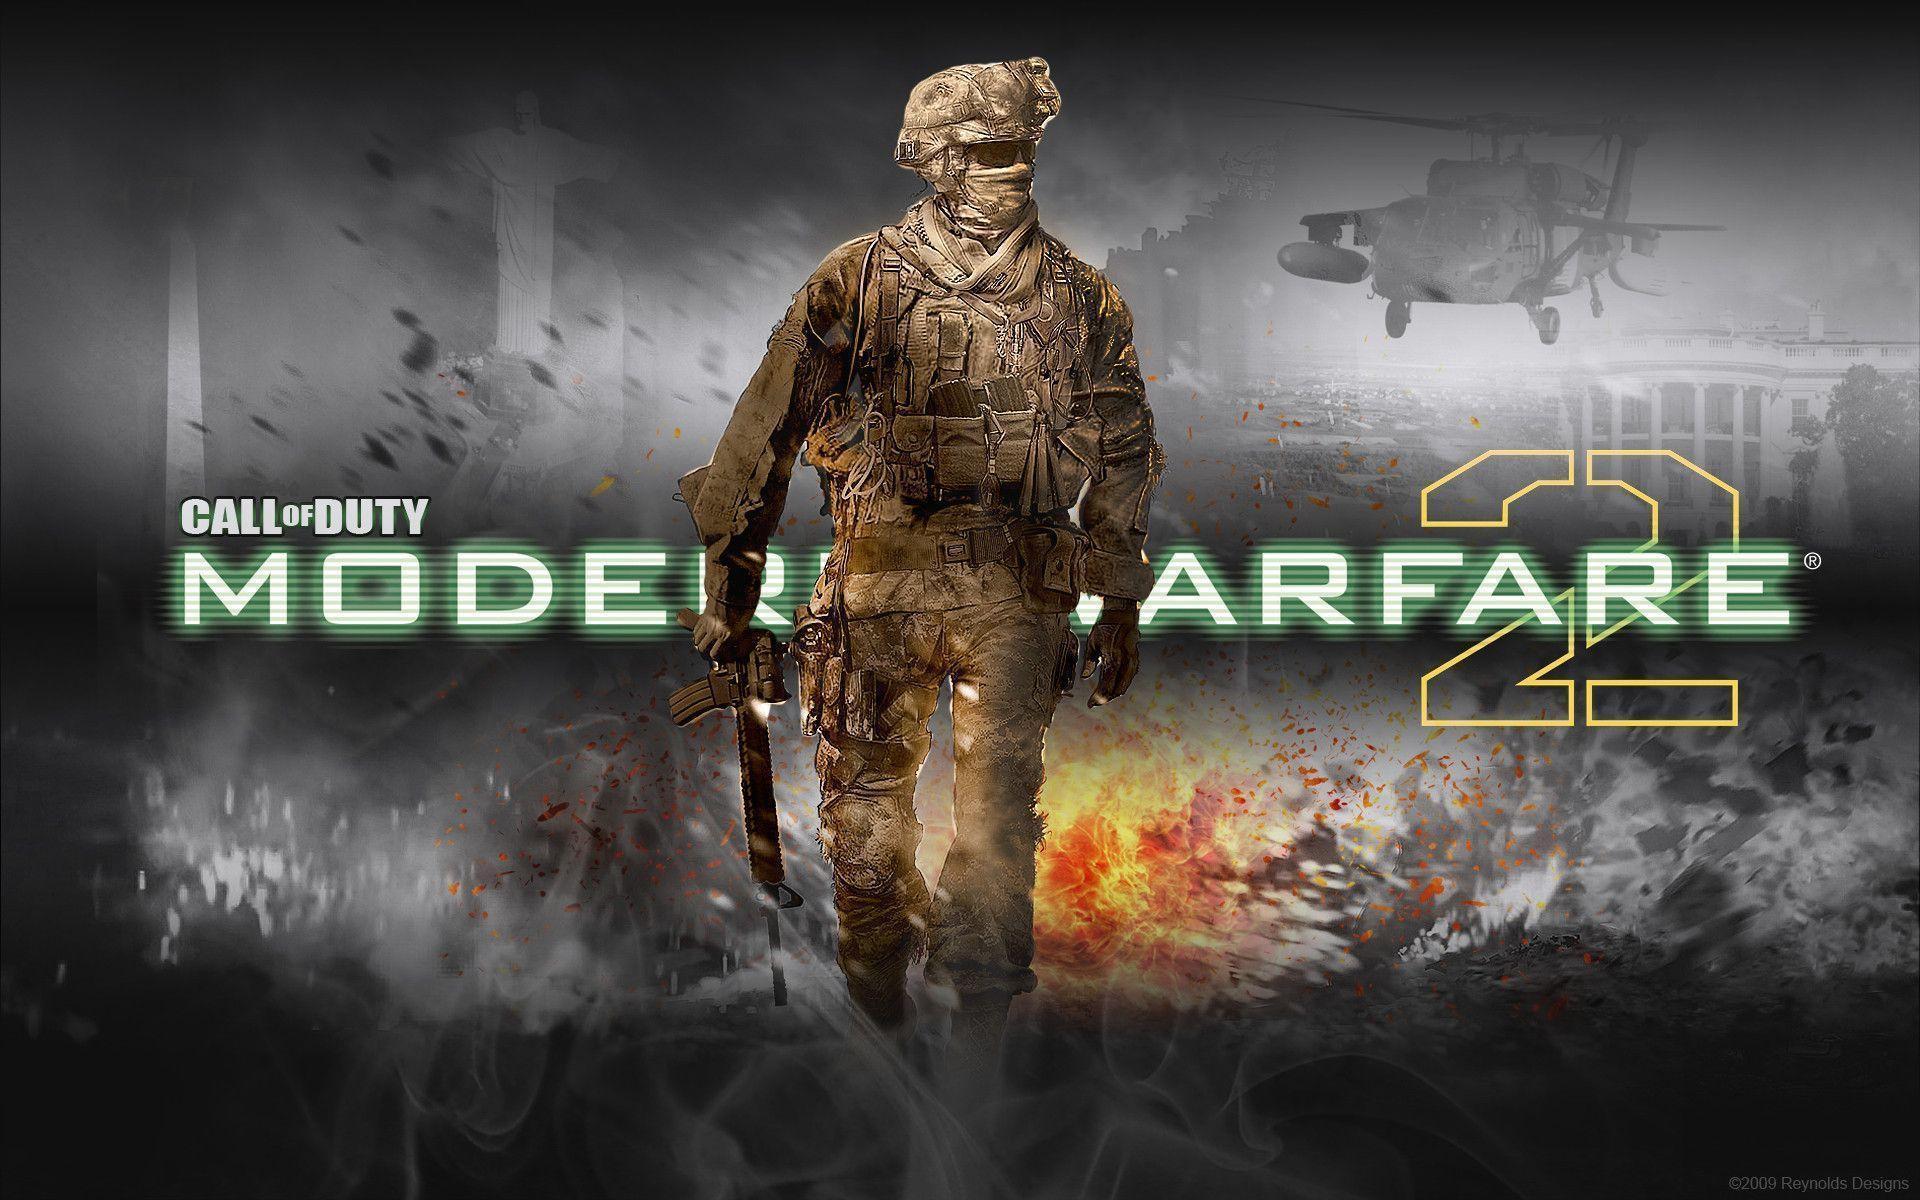 Video games Call of Duty Call of Duty: Modern Warfare 2